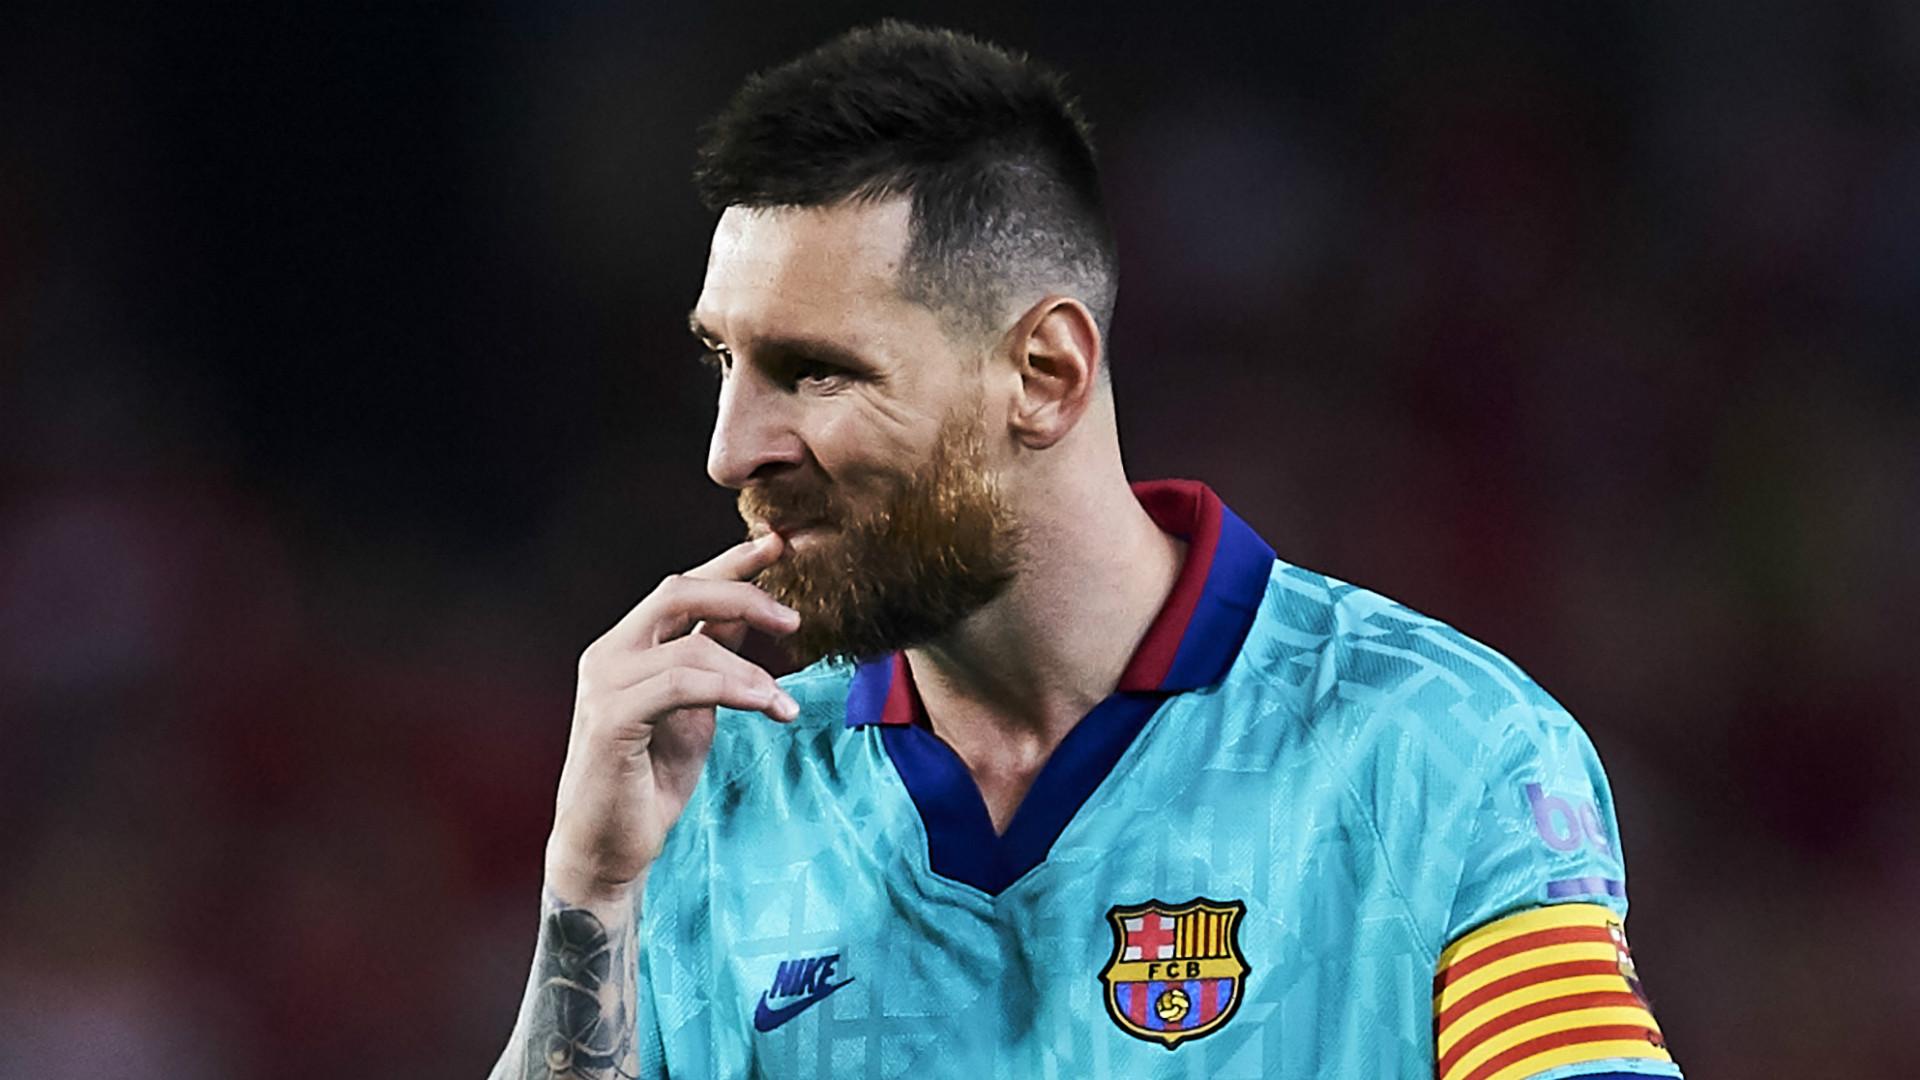 Video: FOOTBALL: La Liga: Messi's 700 matches for Barca